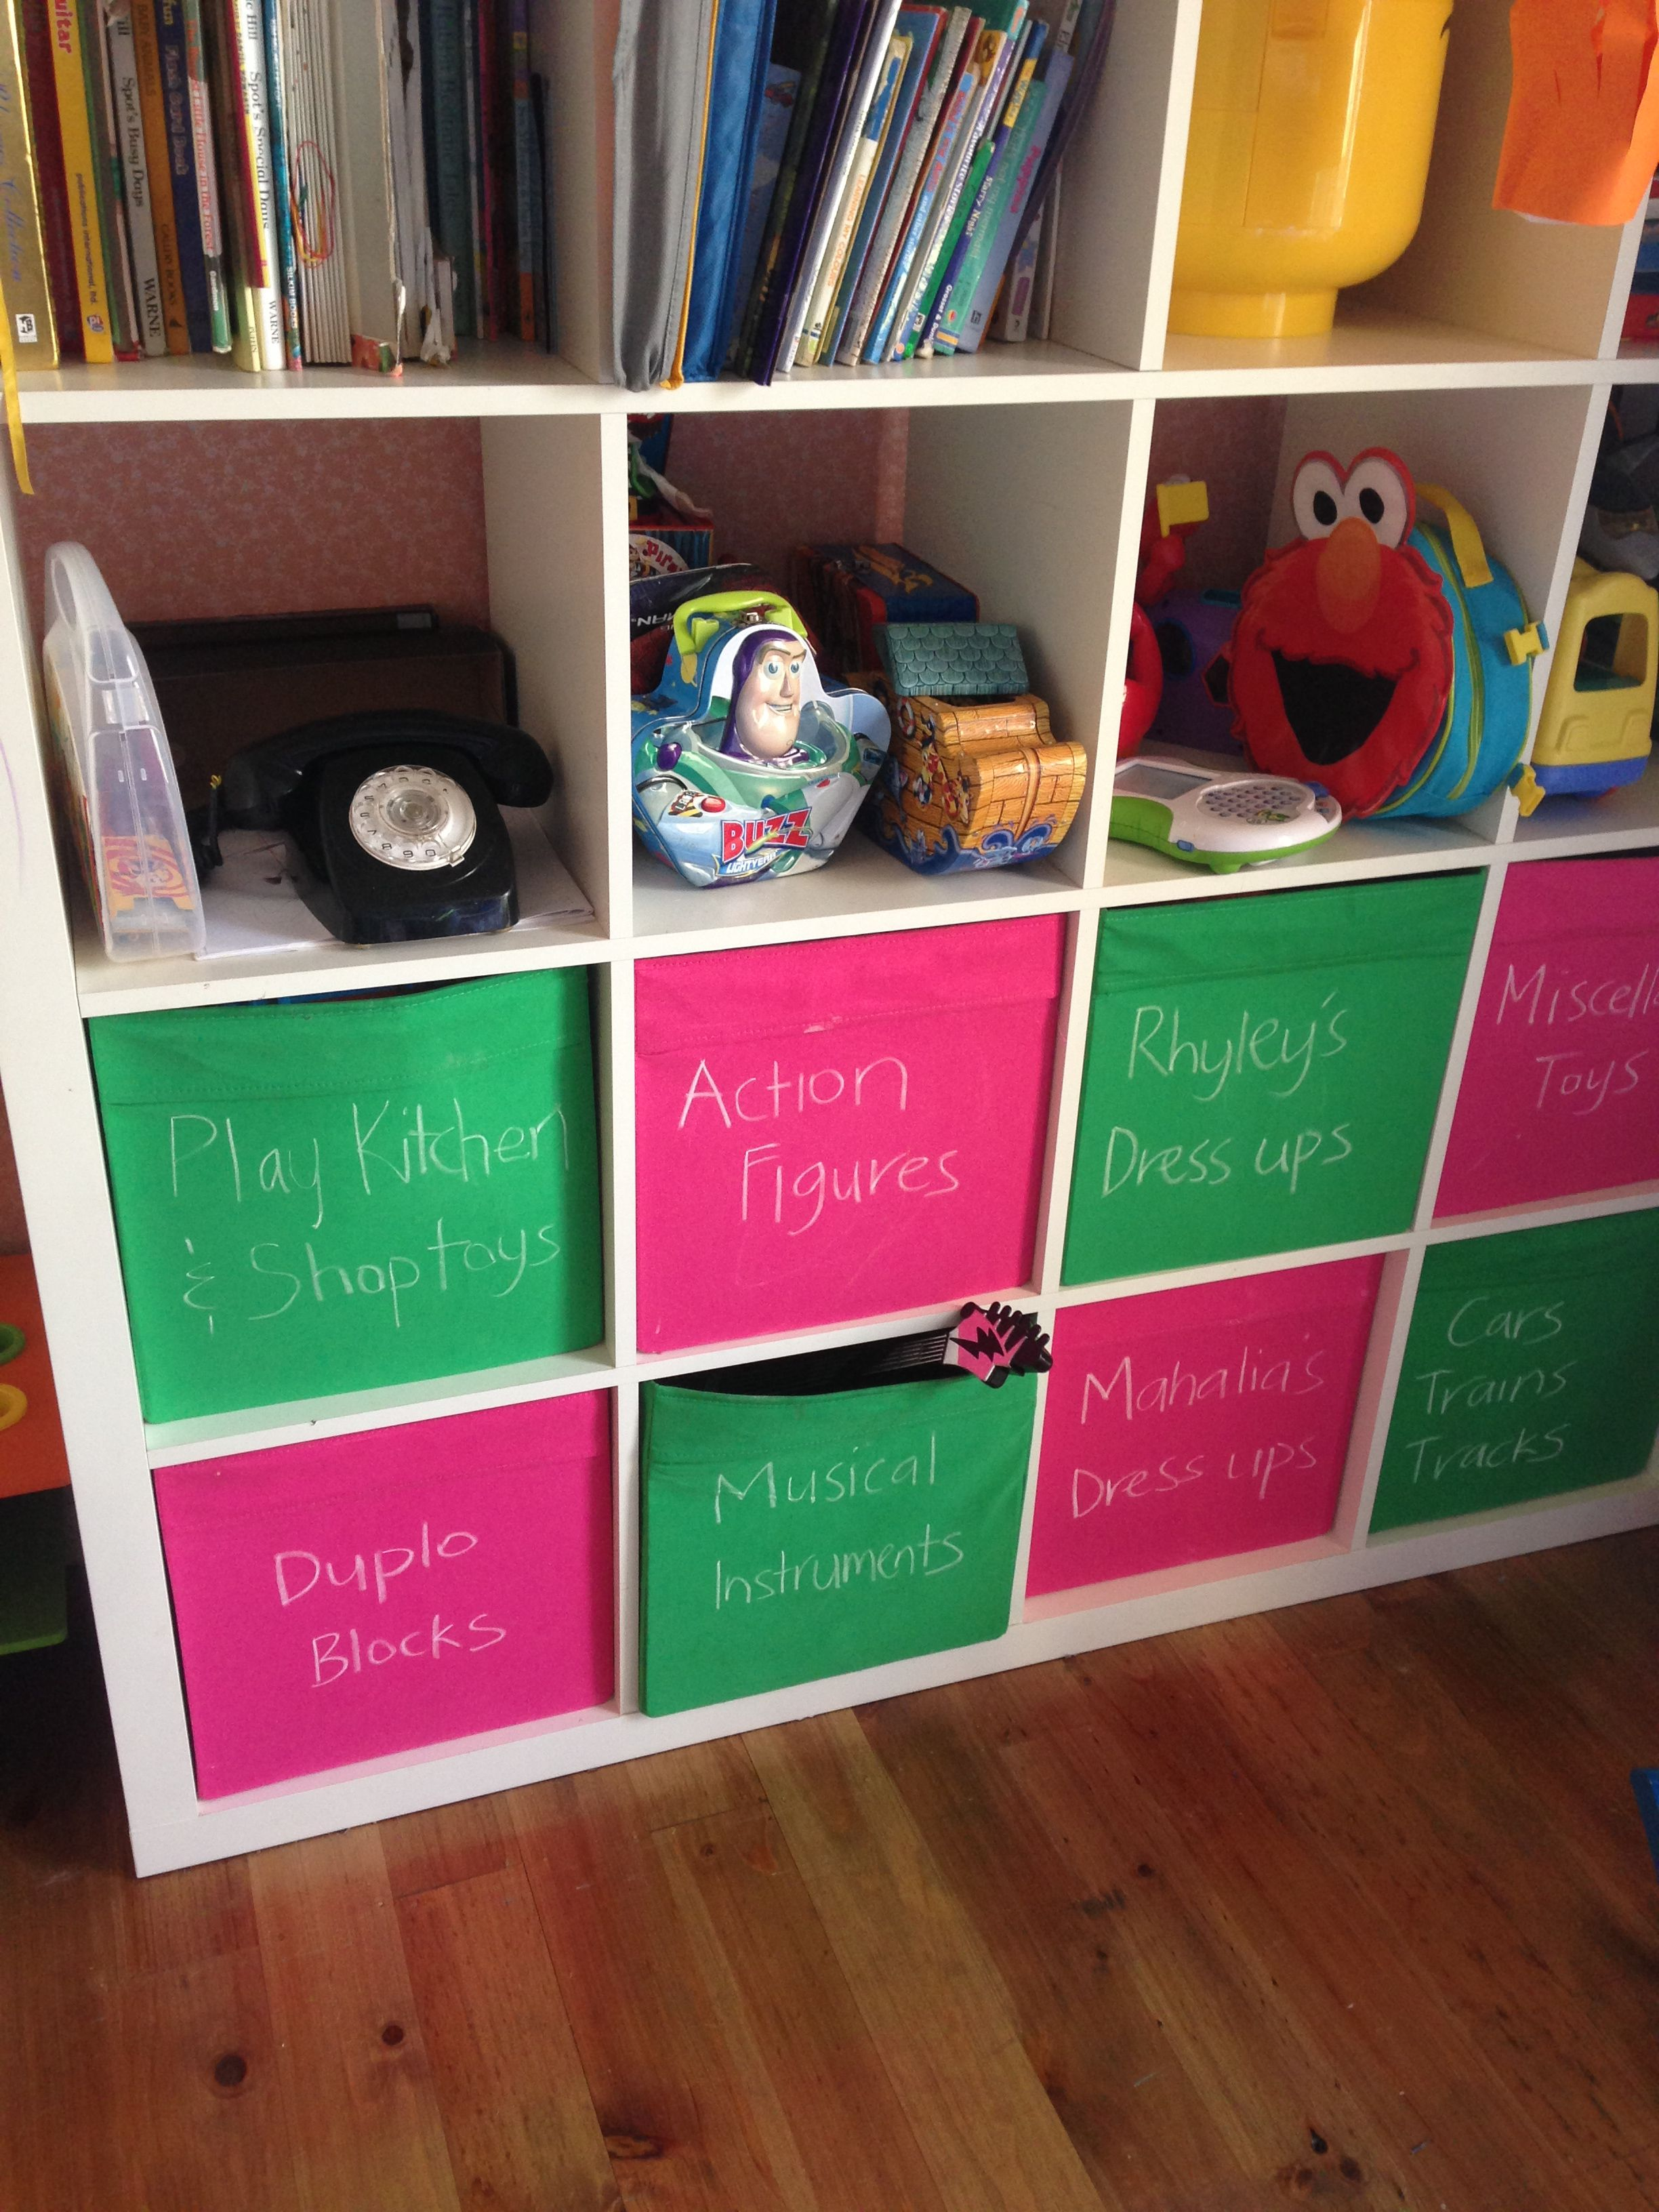 Kids Storage Cube Organizer Toy Box Kids Bedroom Furniture: Kids Storage Idea. Cube Storage Shelves From Ikea. Pink